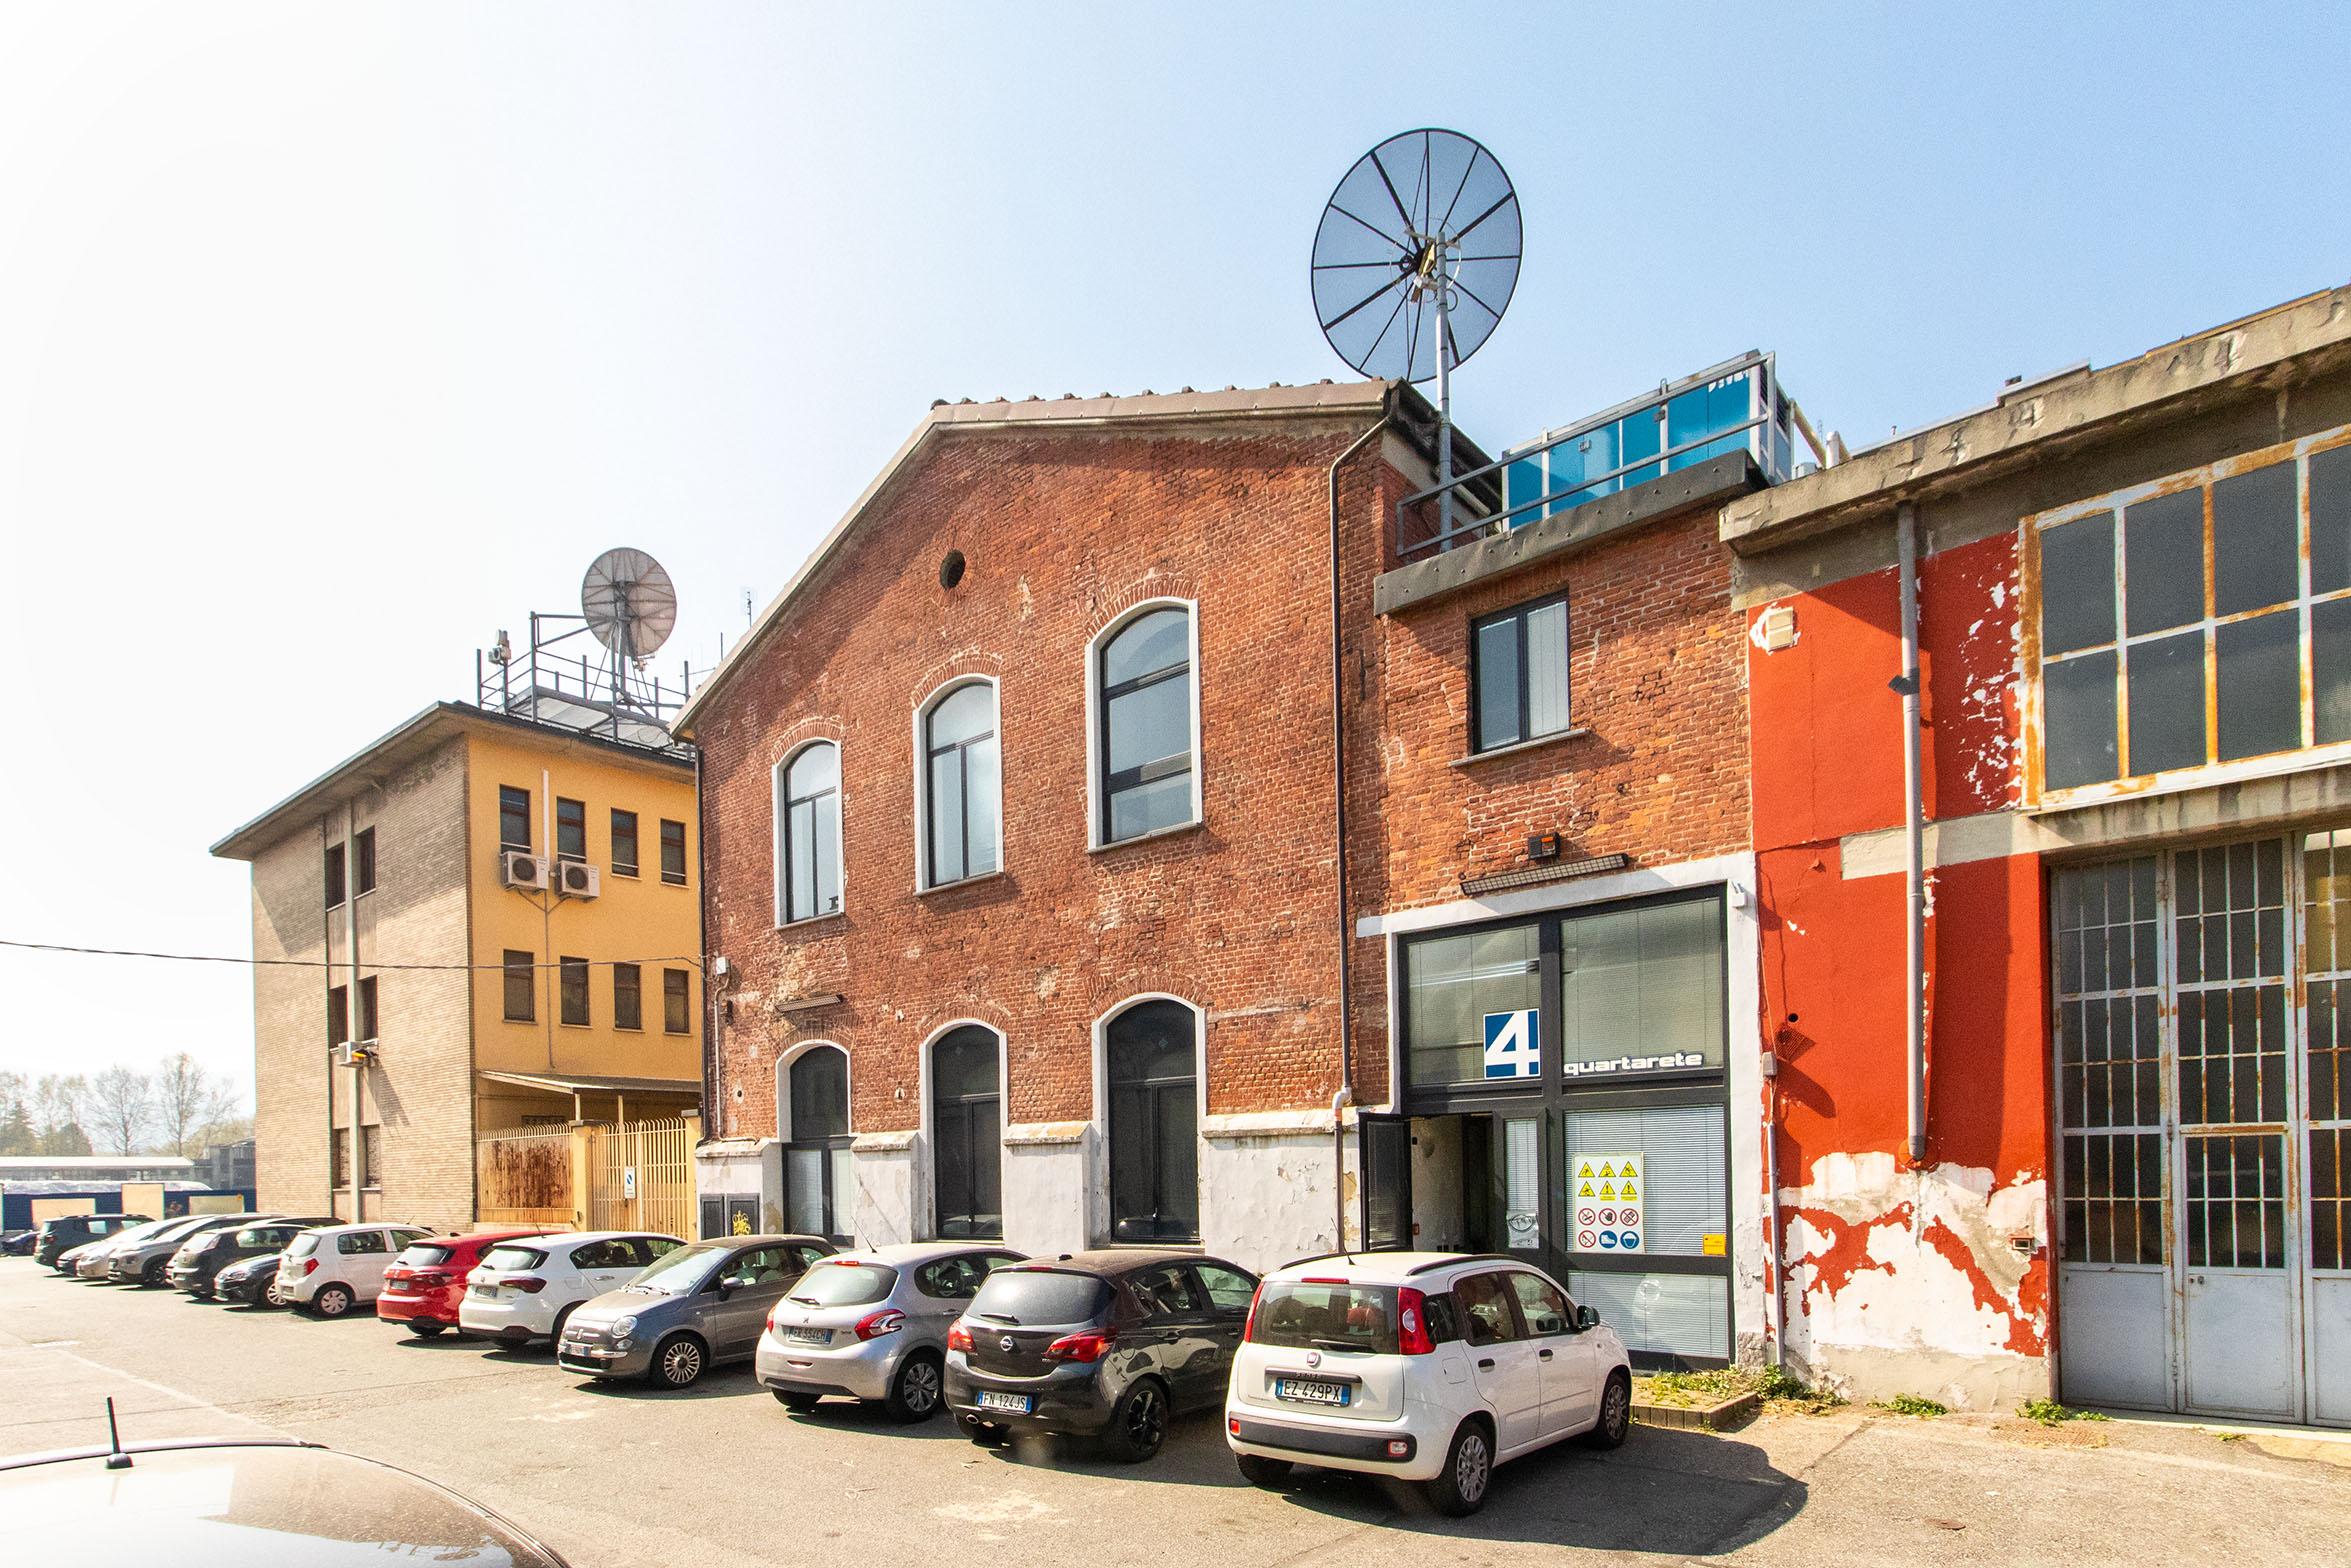 Palazzina Uffici: Corso Novara, Barriera di Milano, Torino